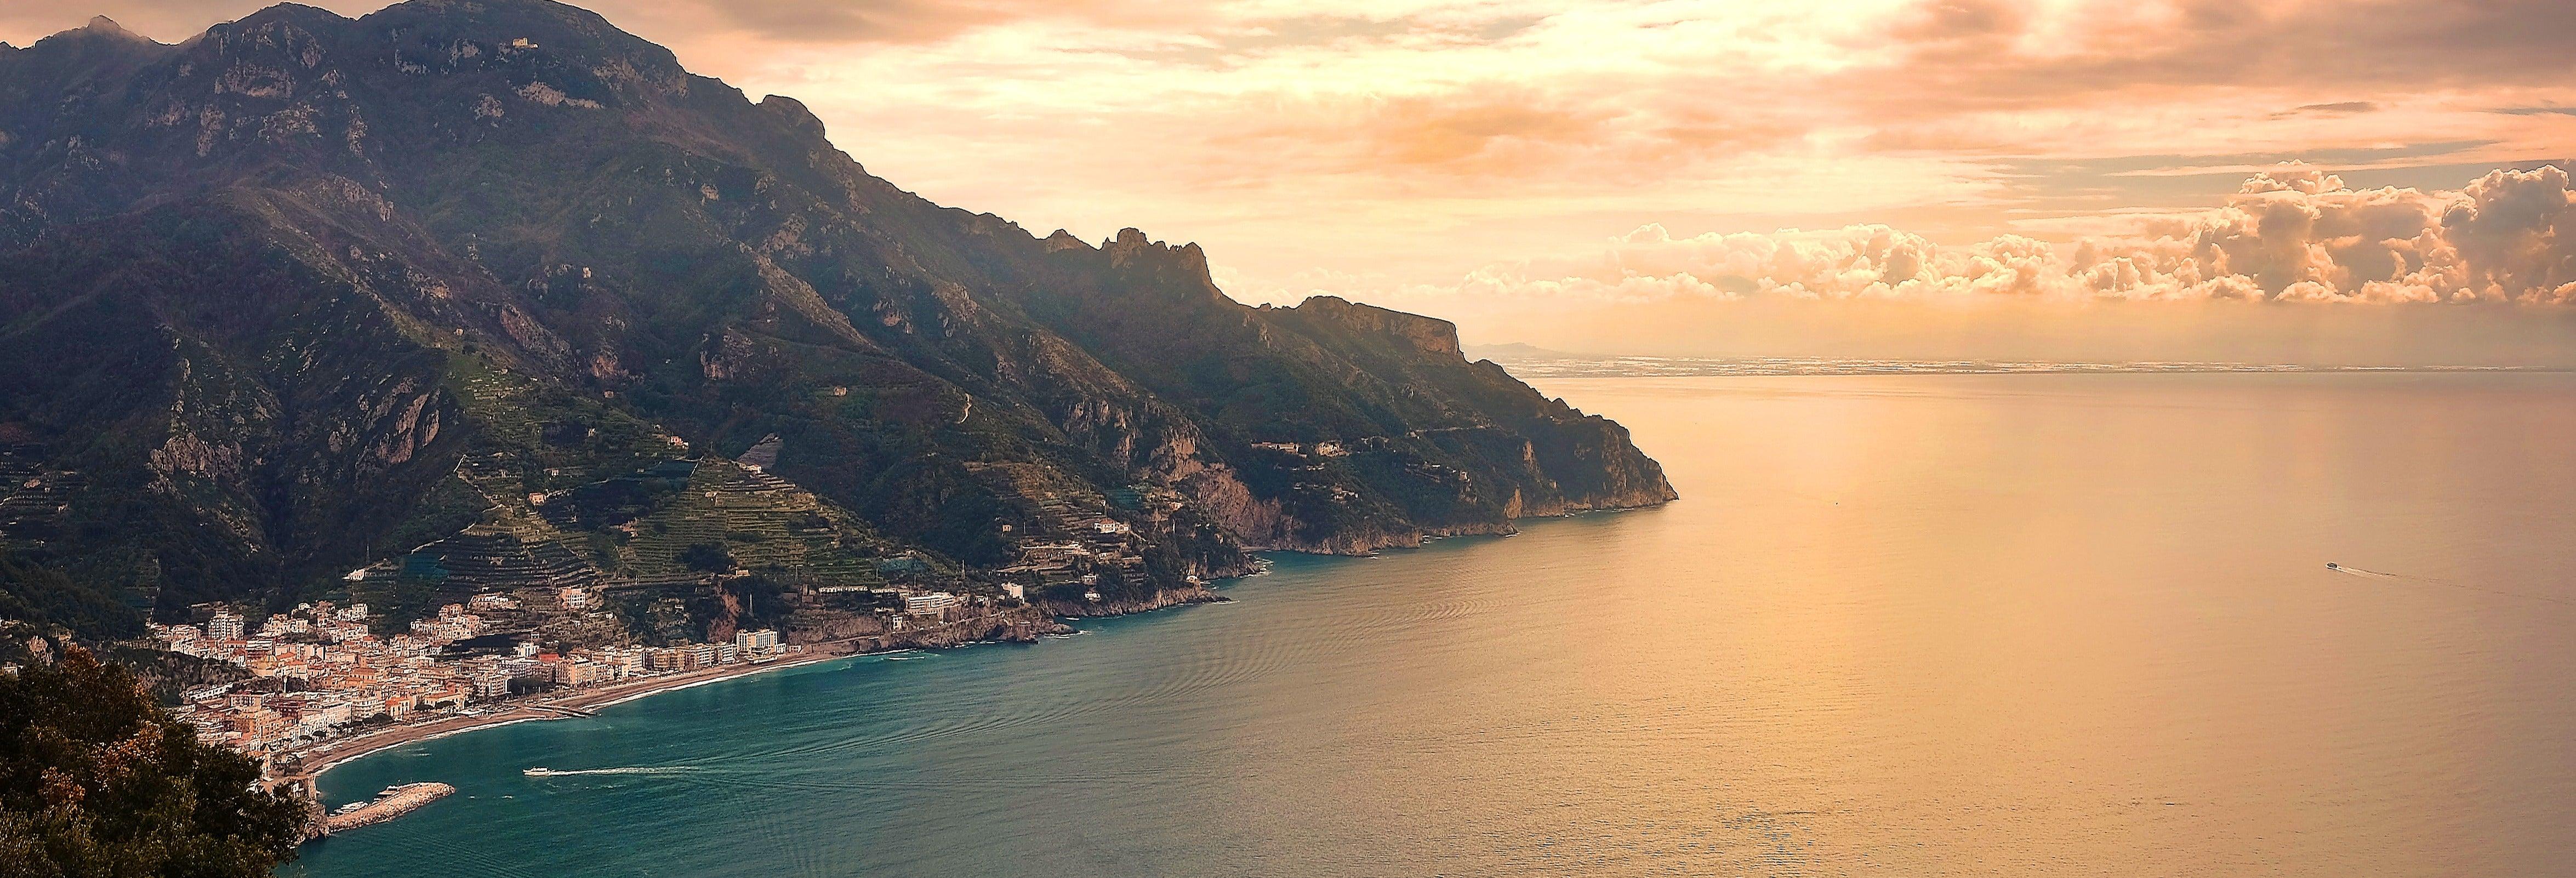 Excursión nocturna a Capri